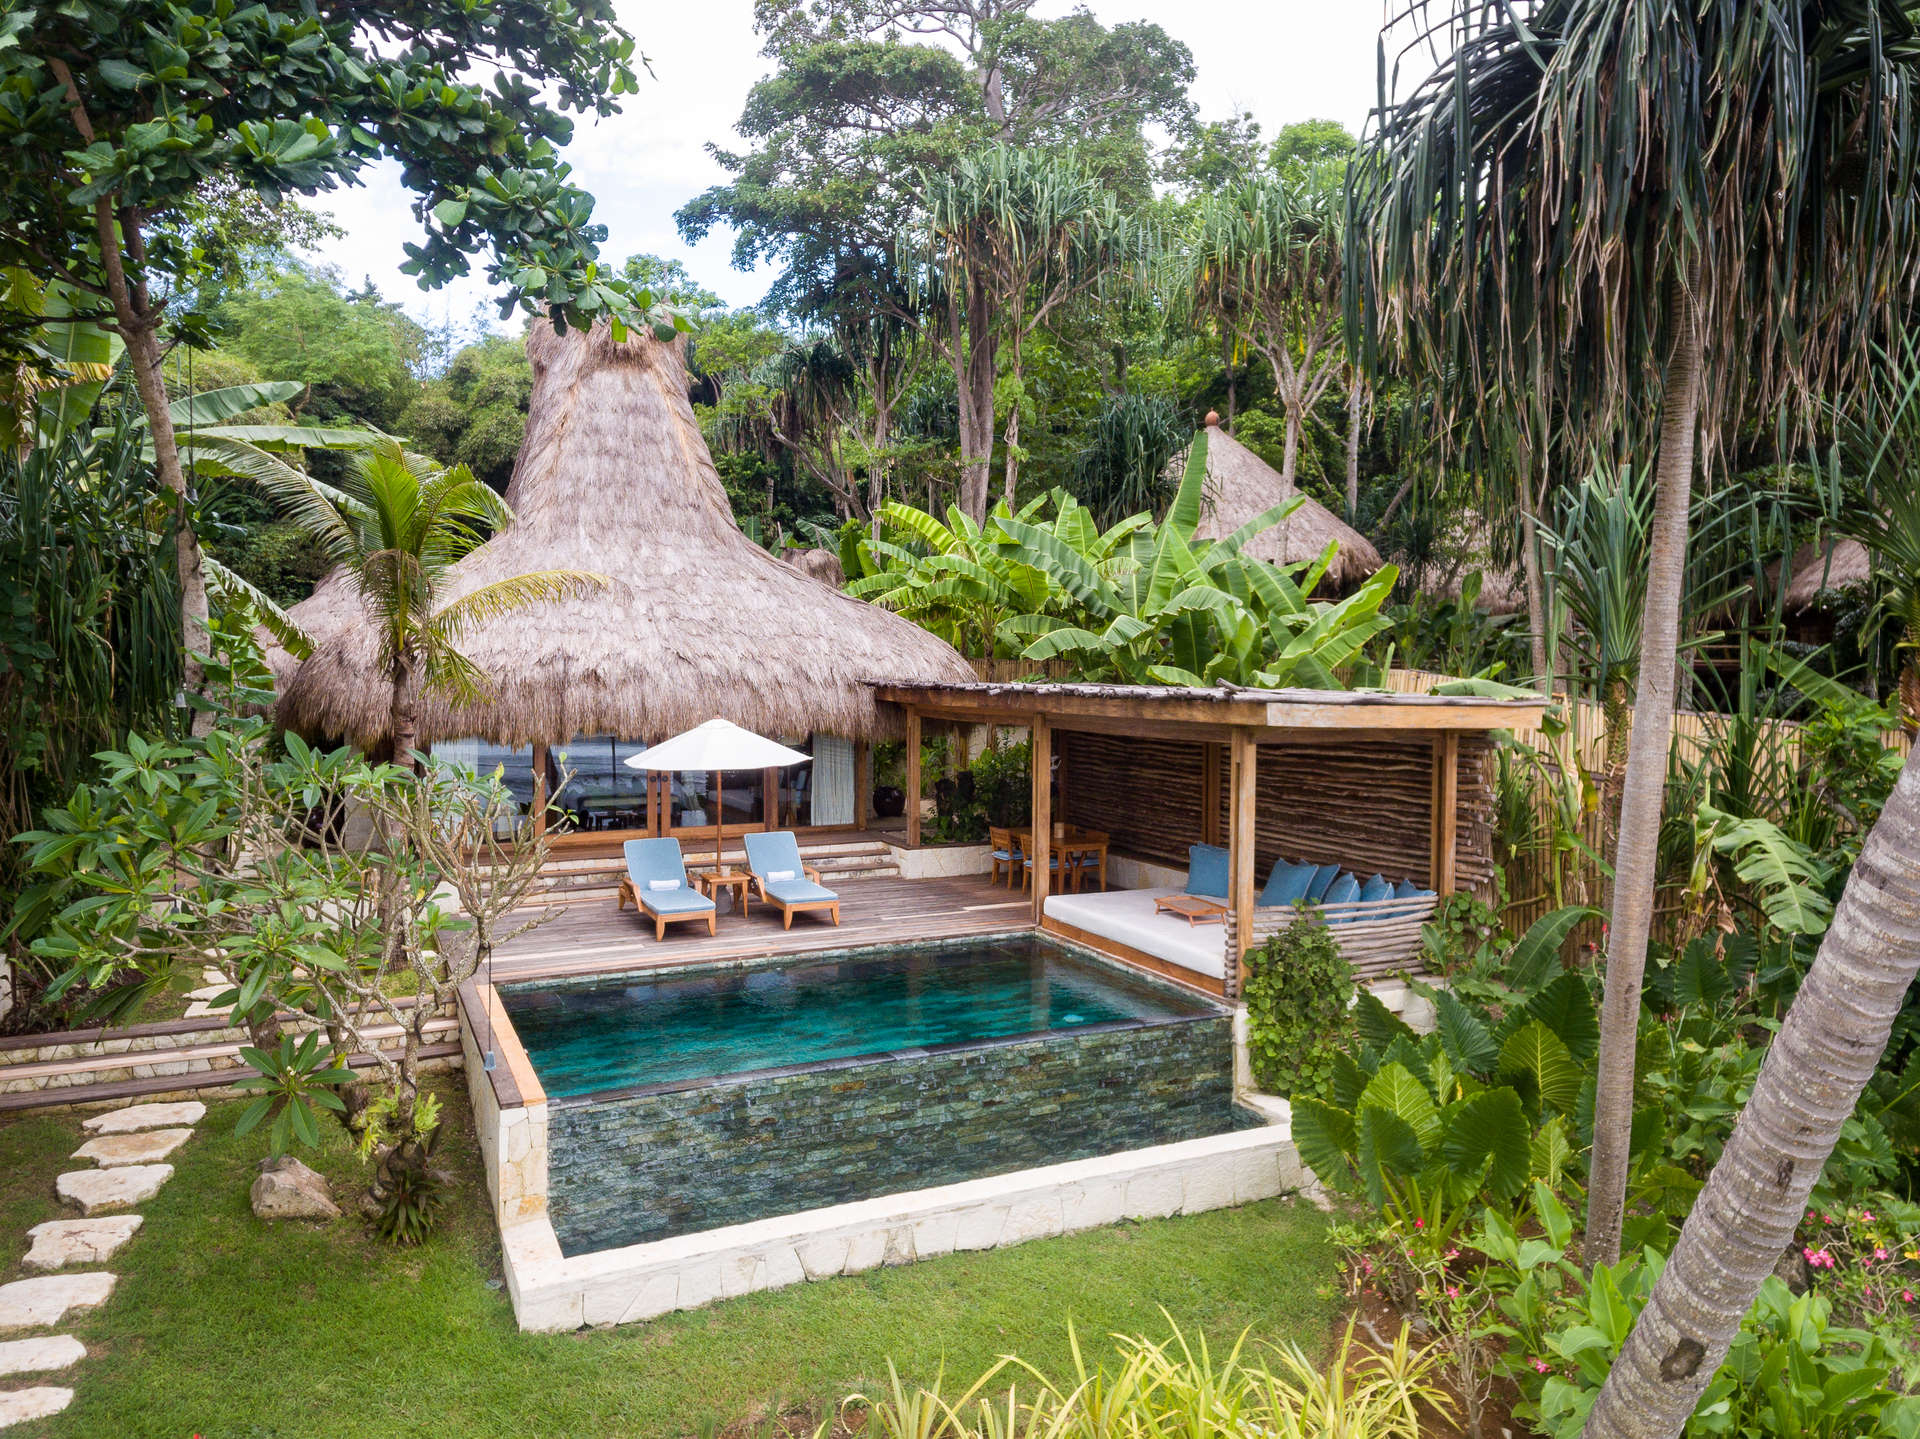 Luxury villa rentals asia - Indonesia - Sumba - Nihi sumba - Marangga Wave Front - Image 1/5